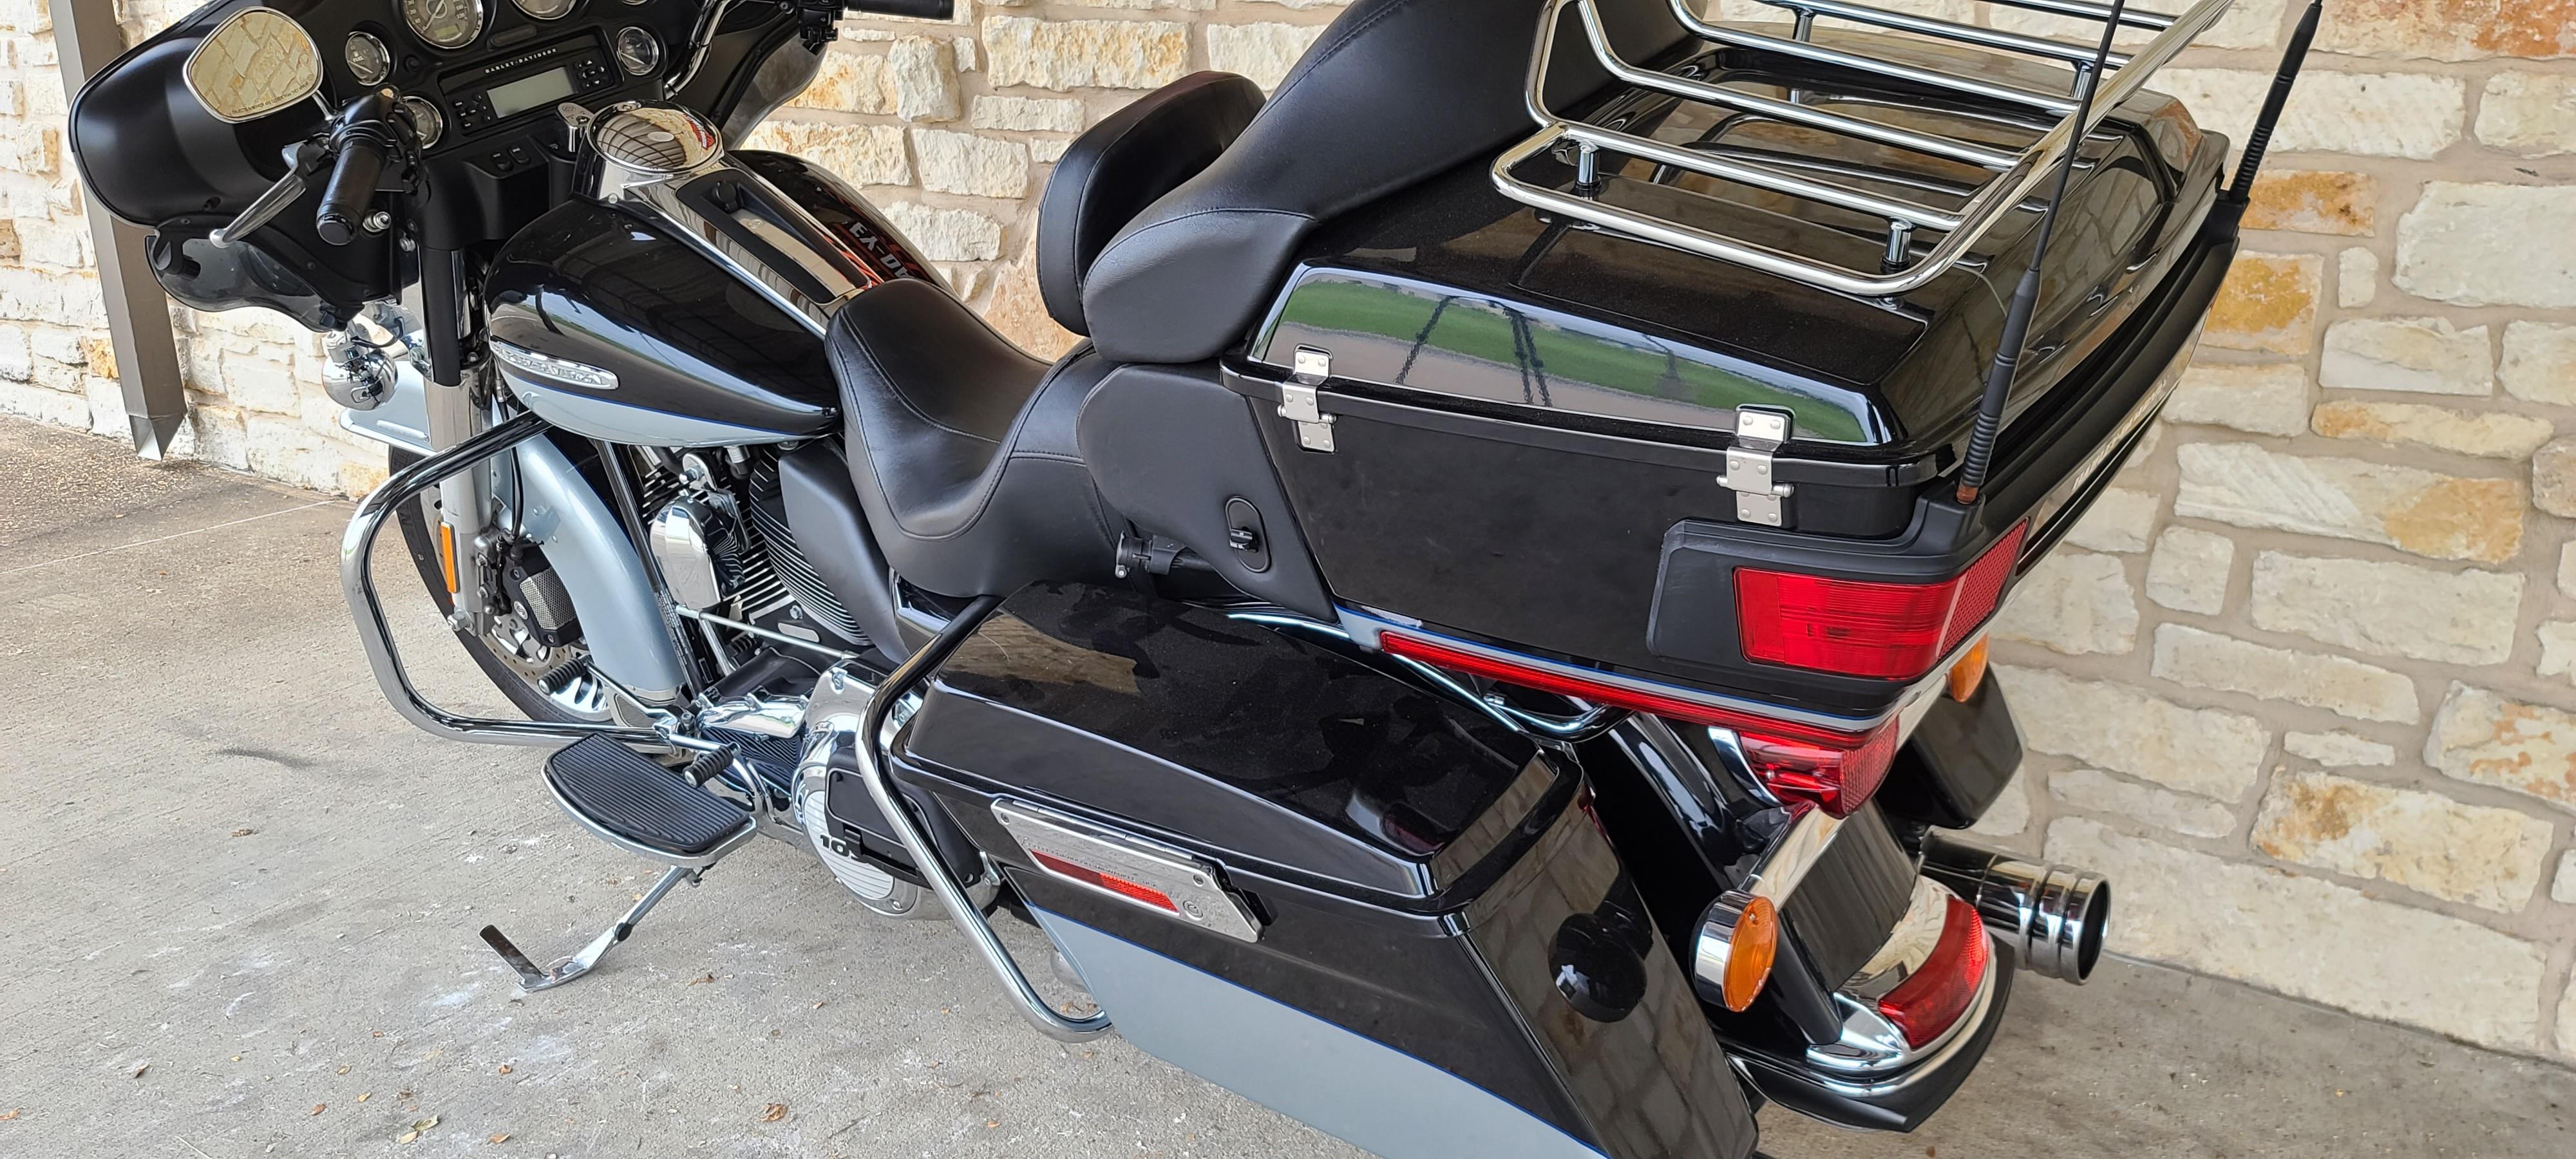 2012 Harley-Davidson Electra Glide Ultra Limited at Harley-Davidson of Waco